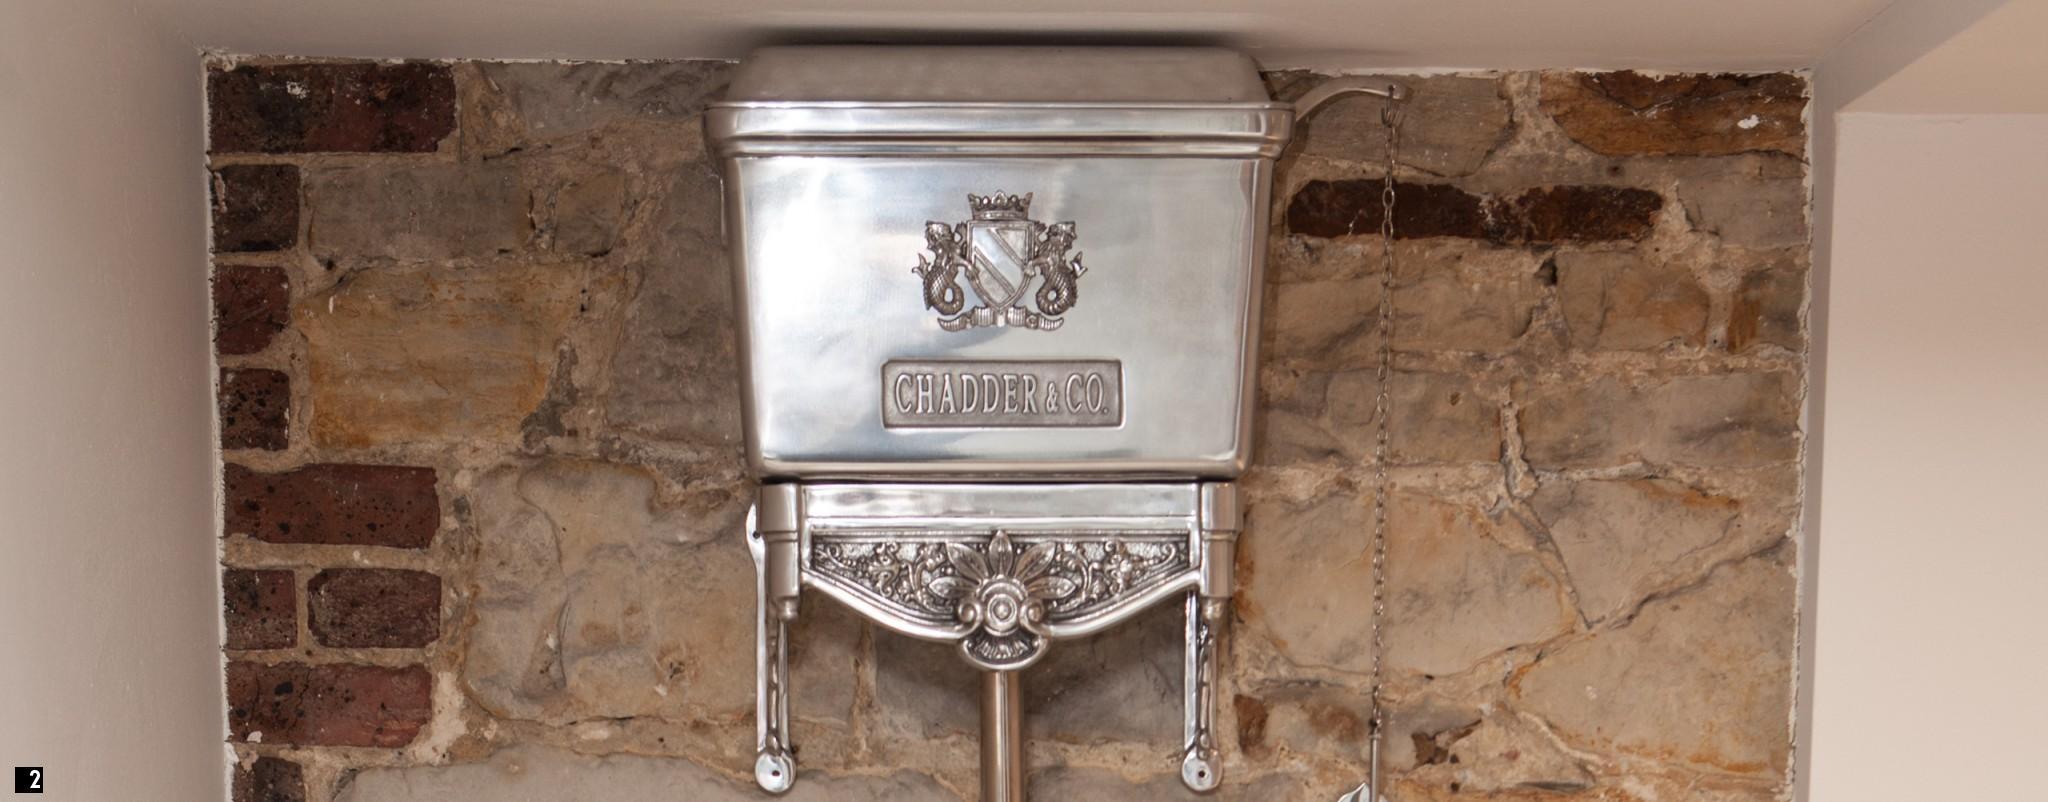 Vintage- Bespoke Toilets - Bespoke Cisterns- Victorian Toilets 1